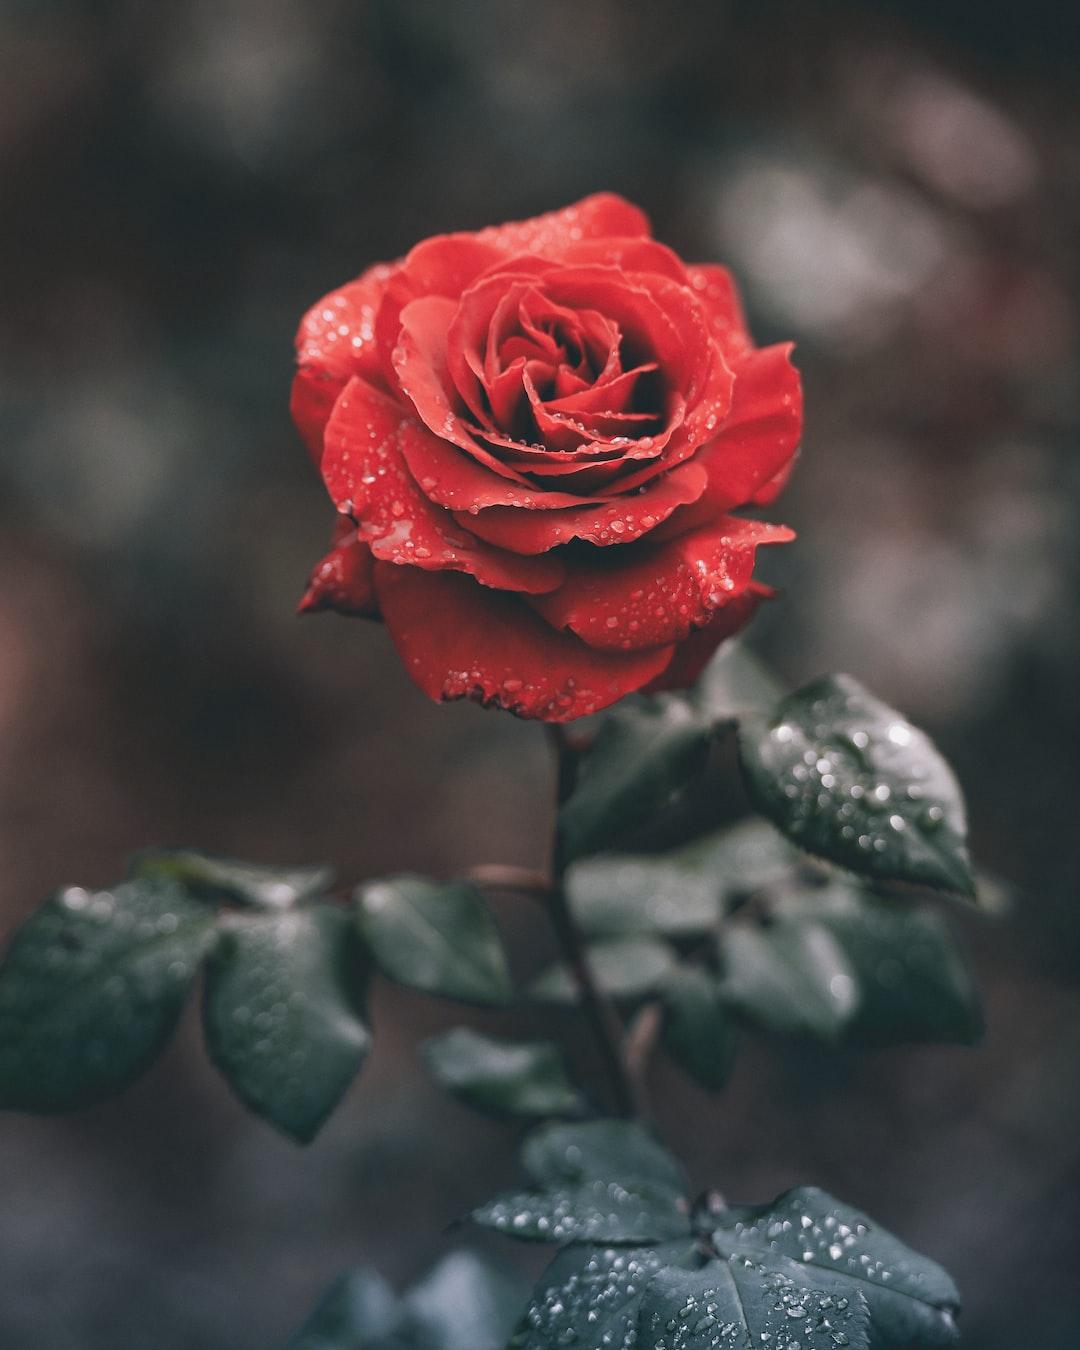 Wet red rose   HD photo by Ameen Fahmy (@ameenfahmy_) on ...